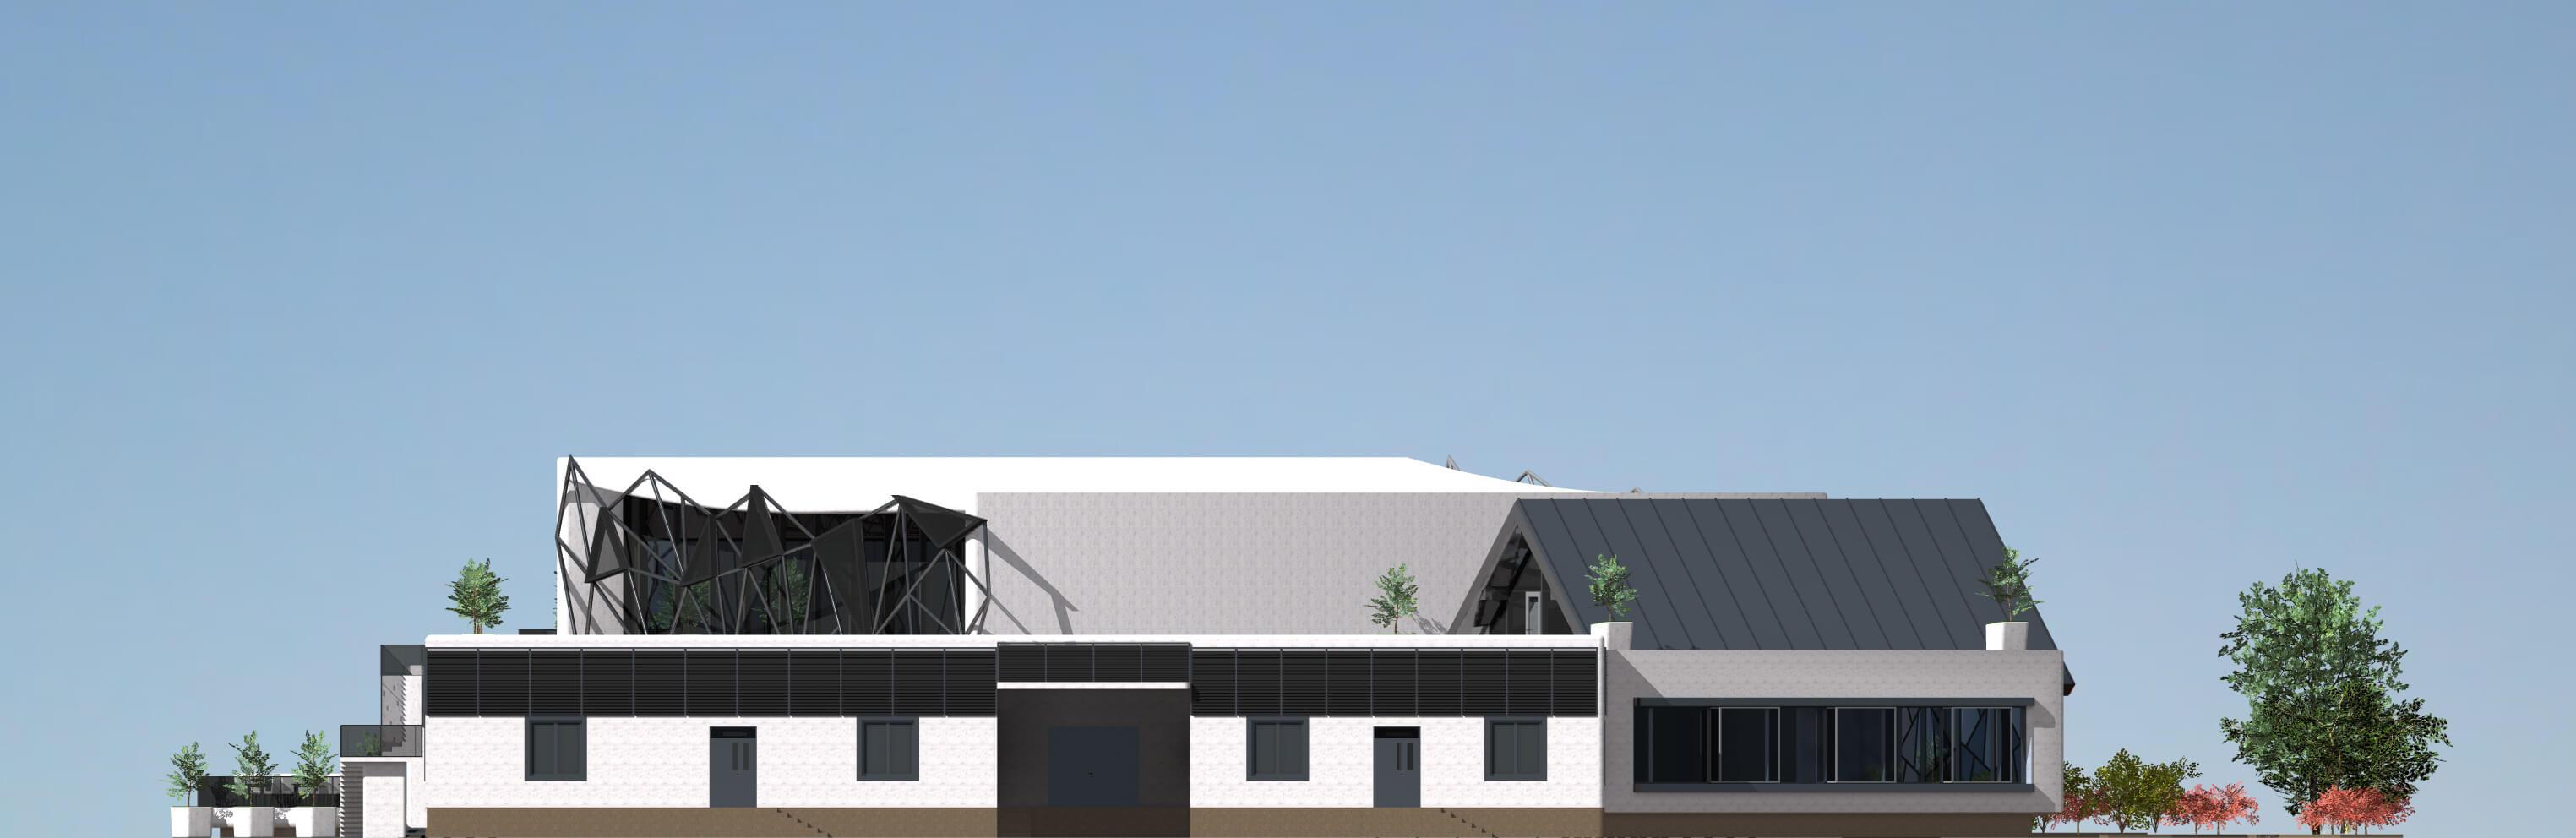 Каскад-Будинвест: проекты компании (изображение 34)